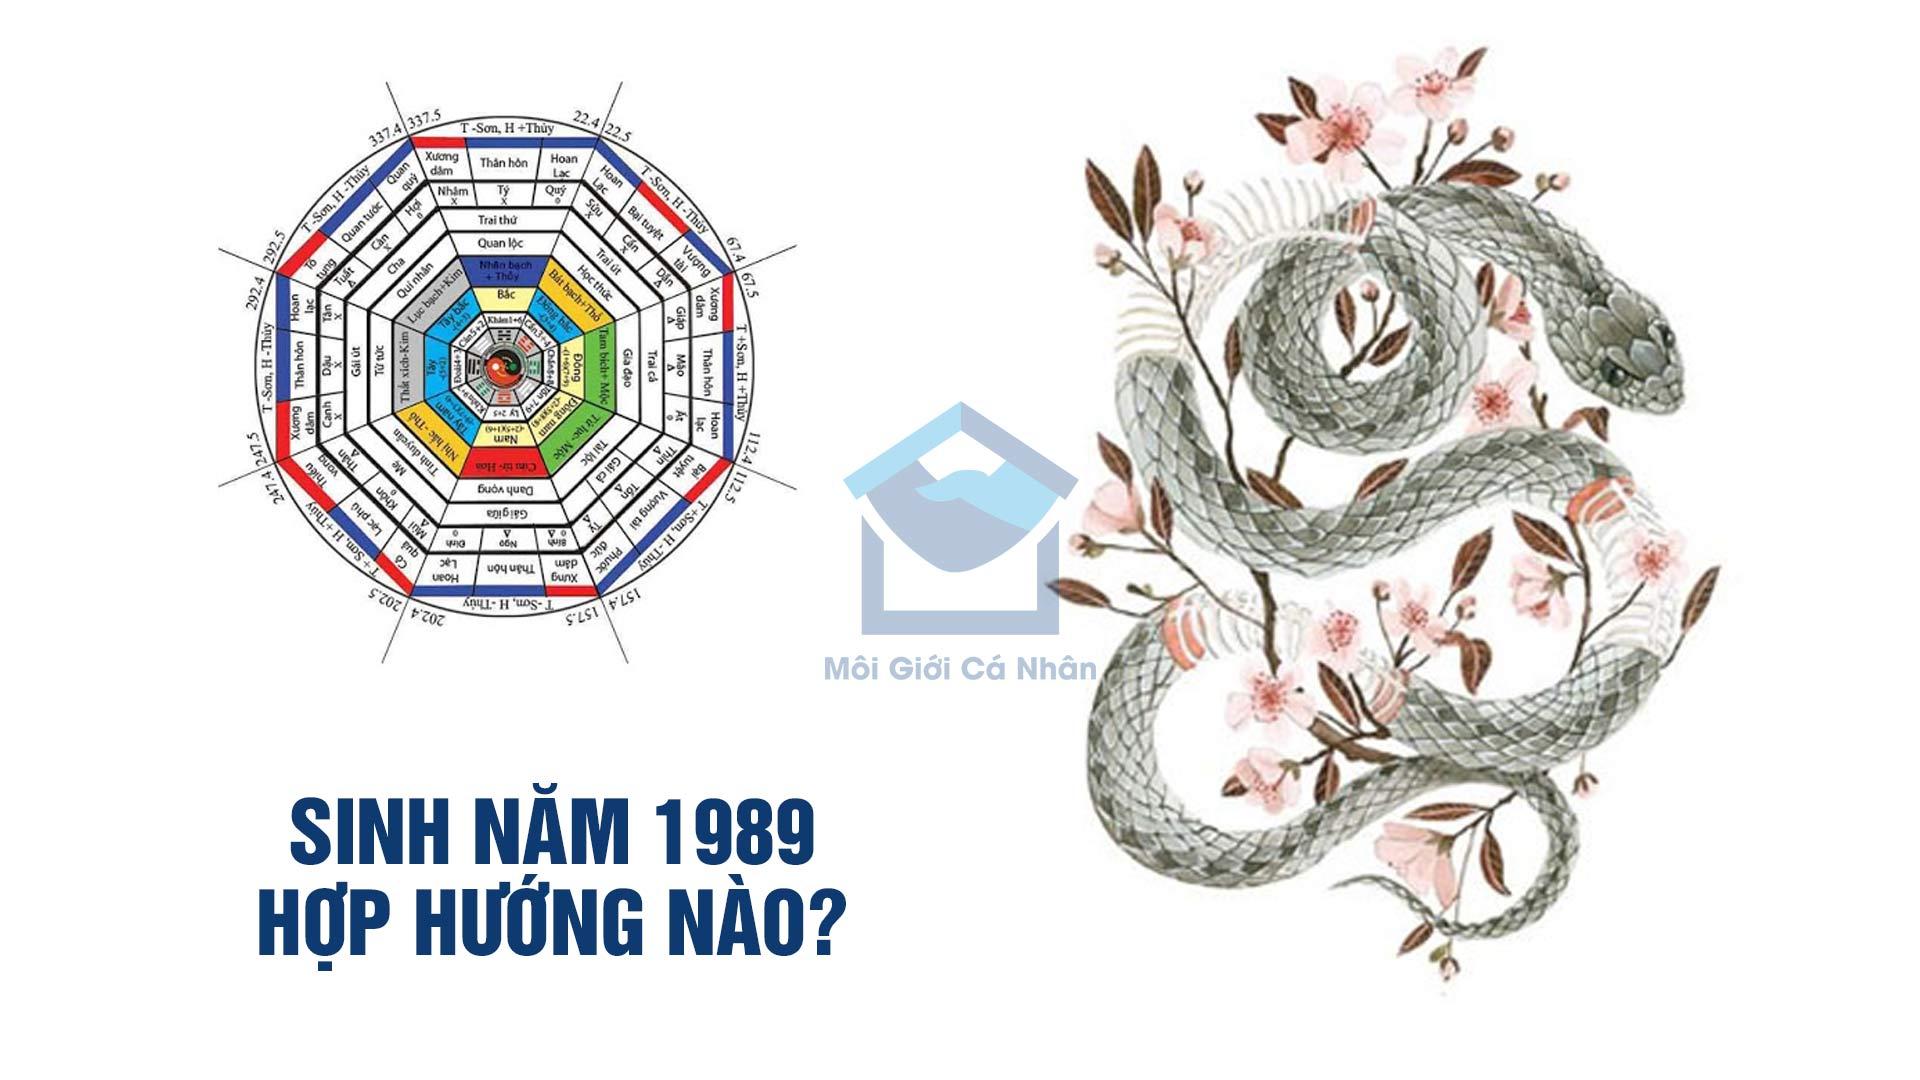 Phong-thuy-huong-nha-tuoi-ky-ty-1989-nu